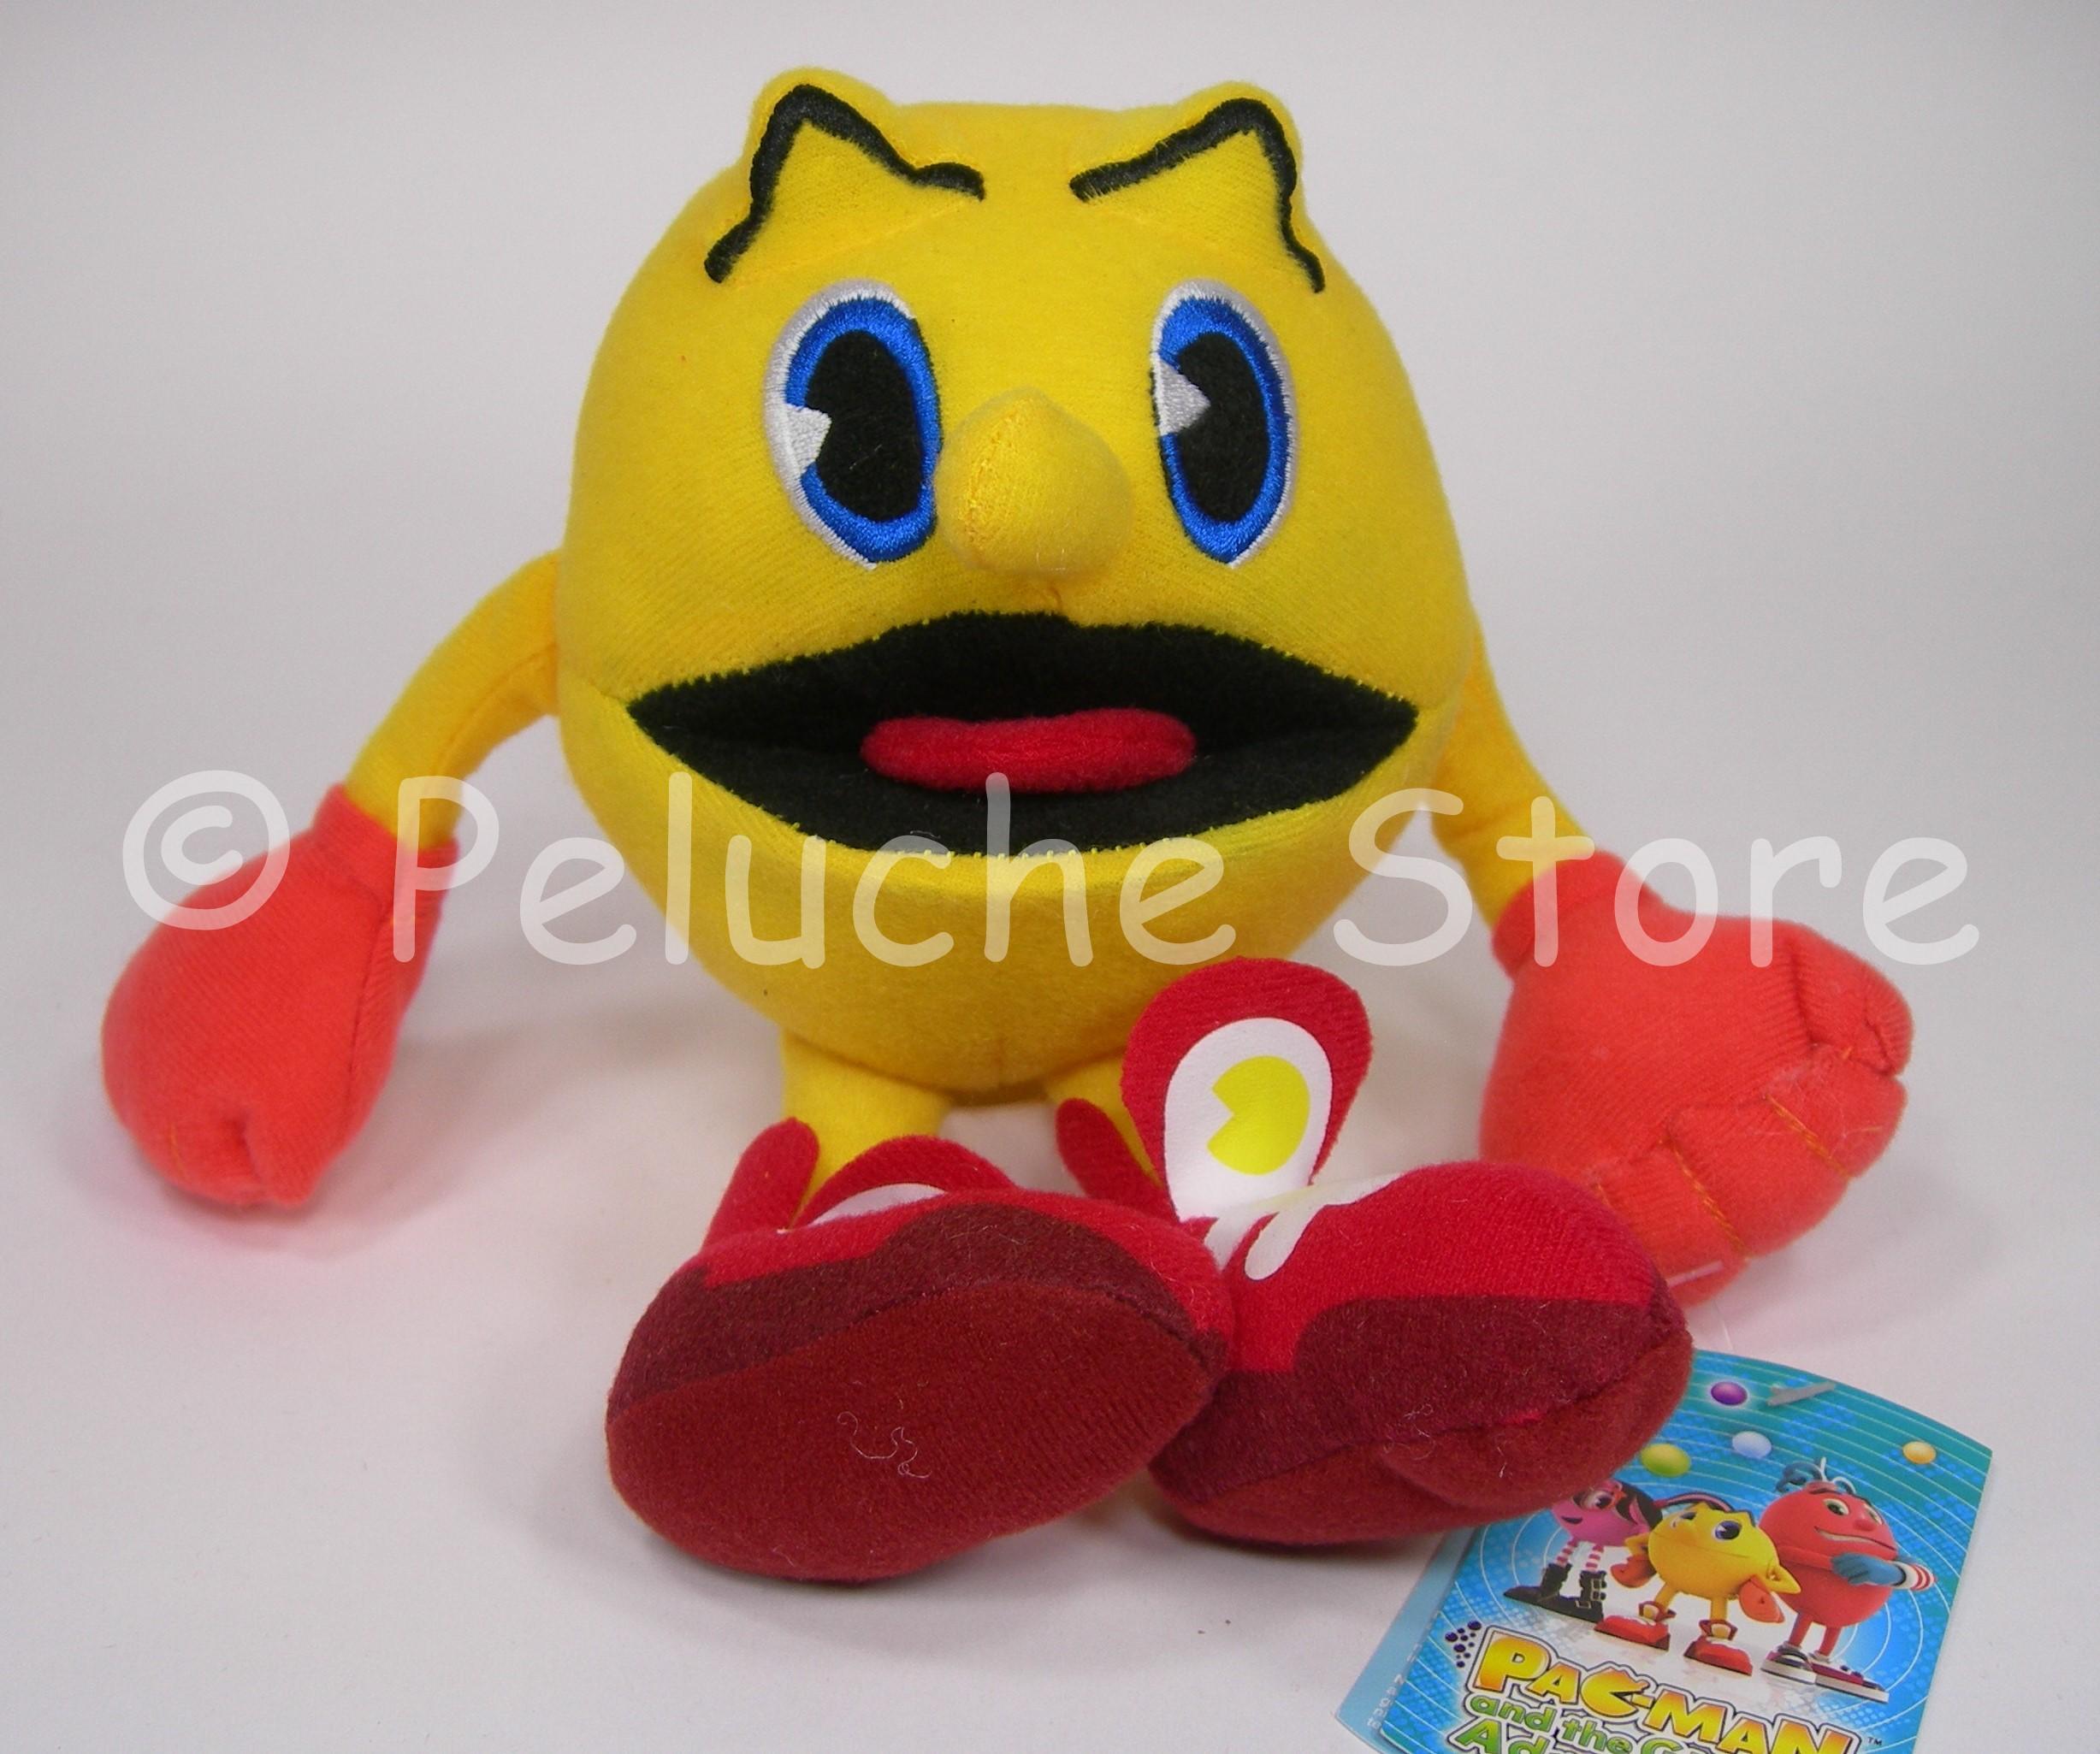 Pac Man Ghostly Adventures peluche da 10 a 15 cm Pacman velluto Originale